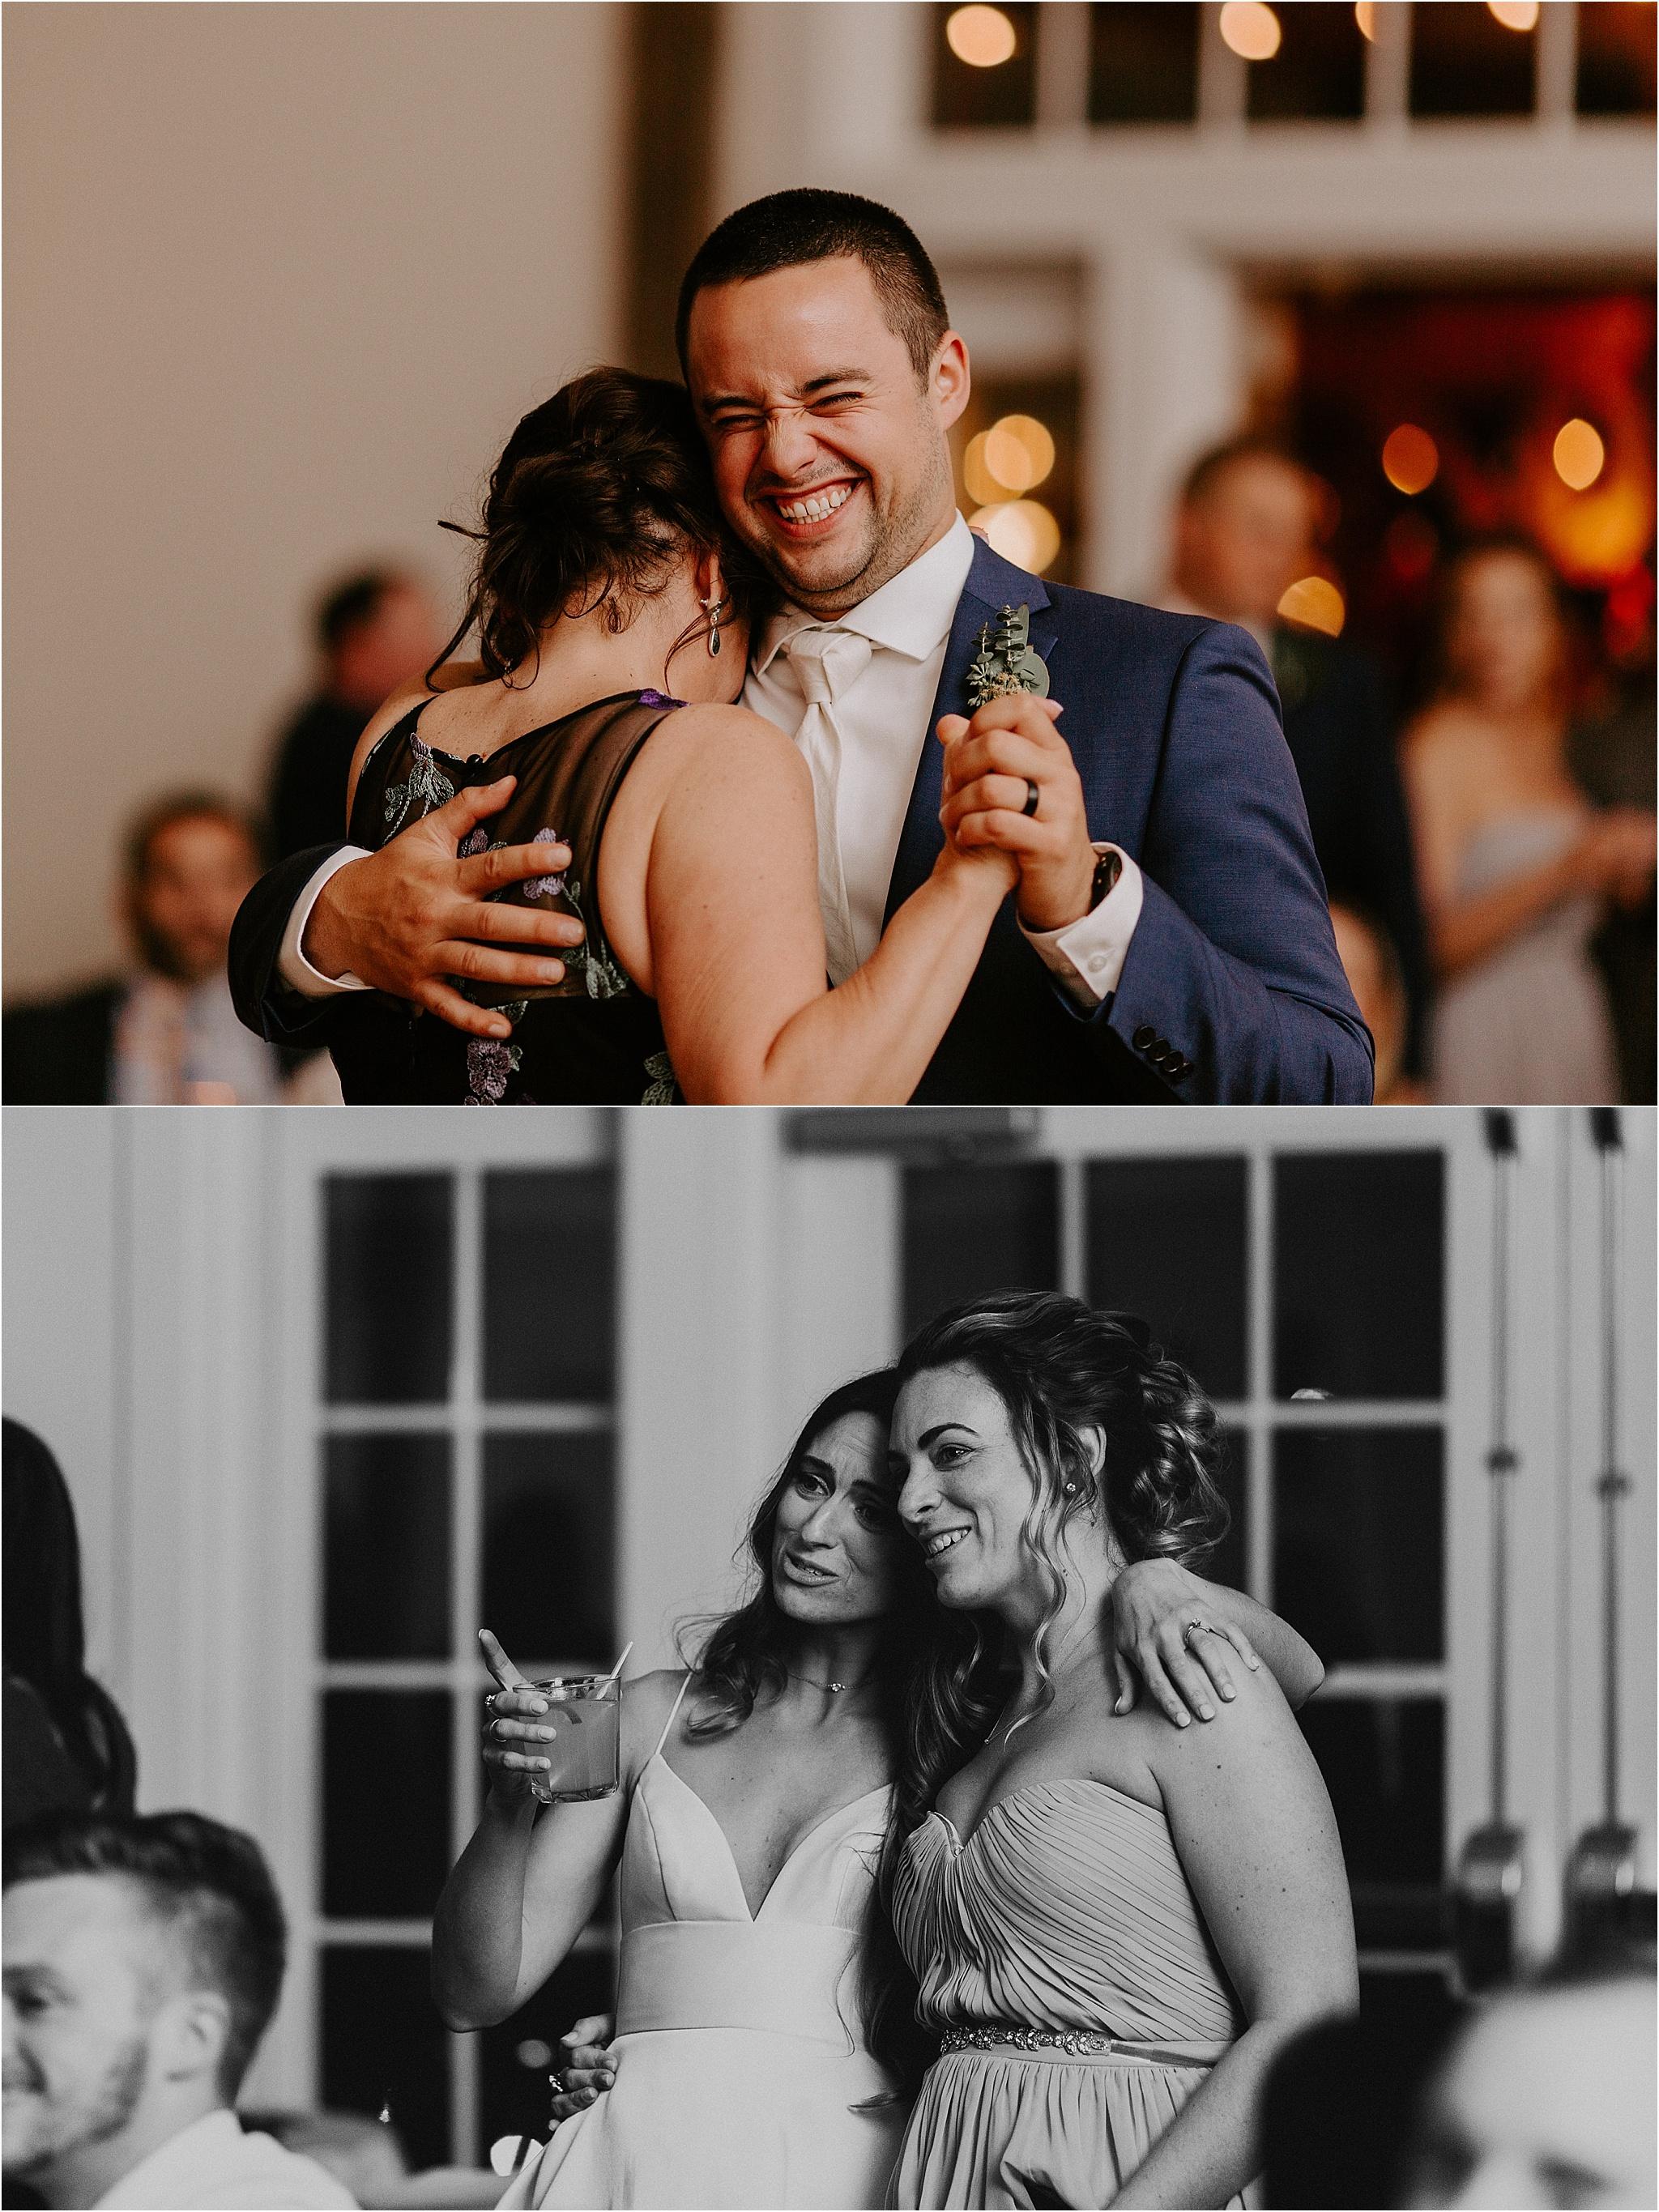 Sarah_Brookhart_Lancaster_PA_Wedding_Photographer_0072.jpg